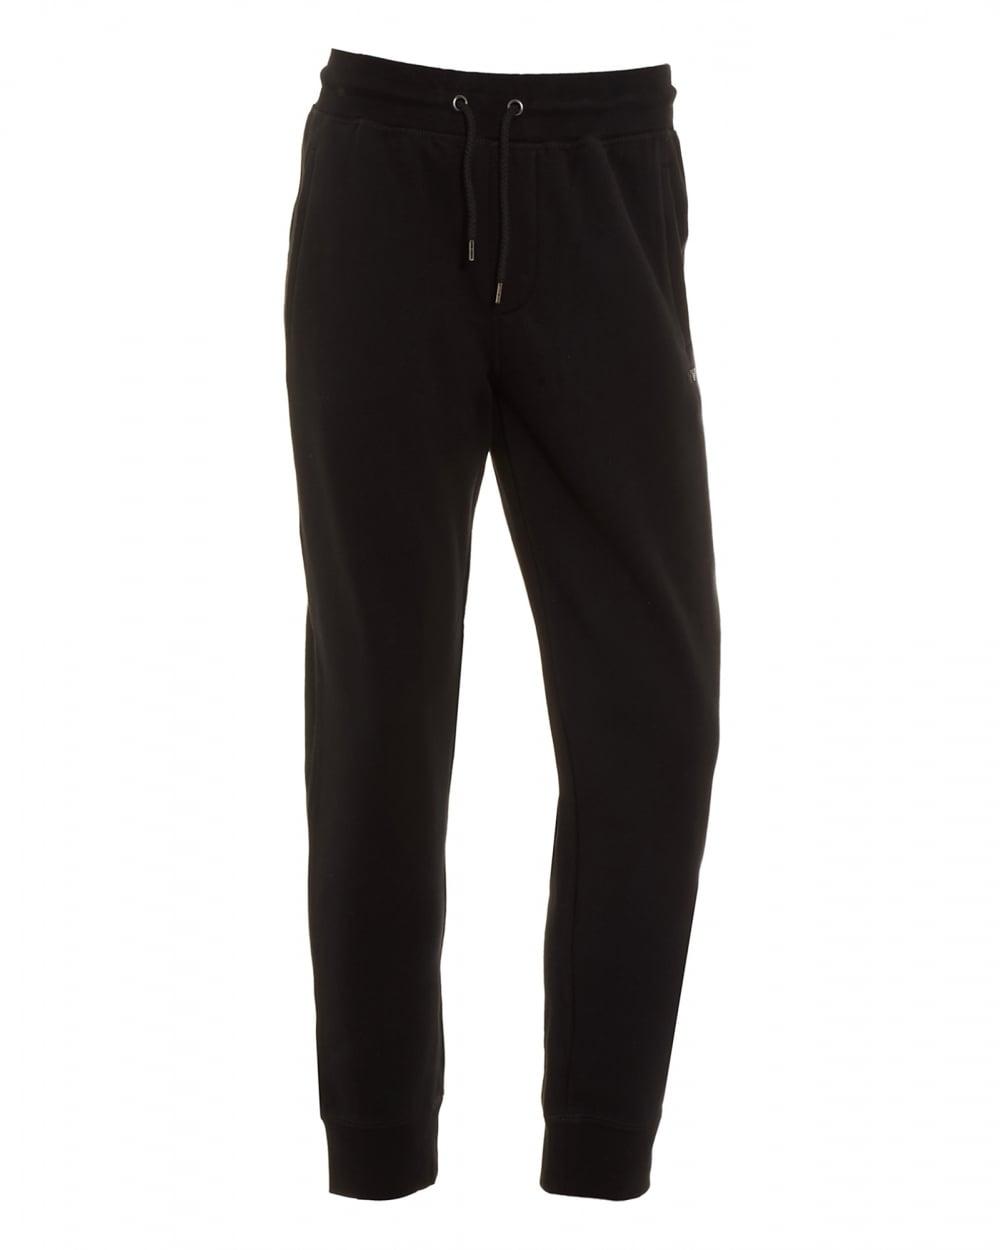 3c892fb44393 Armani Jeans Mens Basic Black Cuffed Trackpant